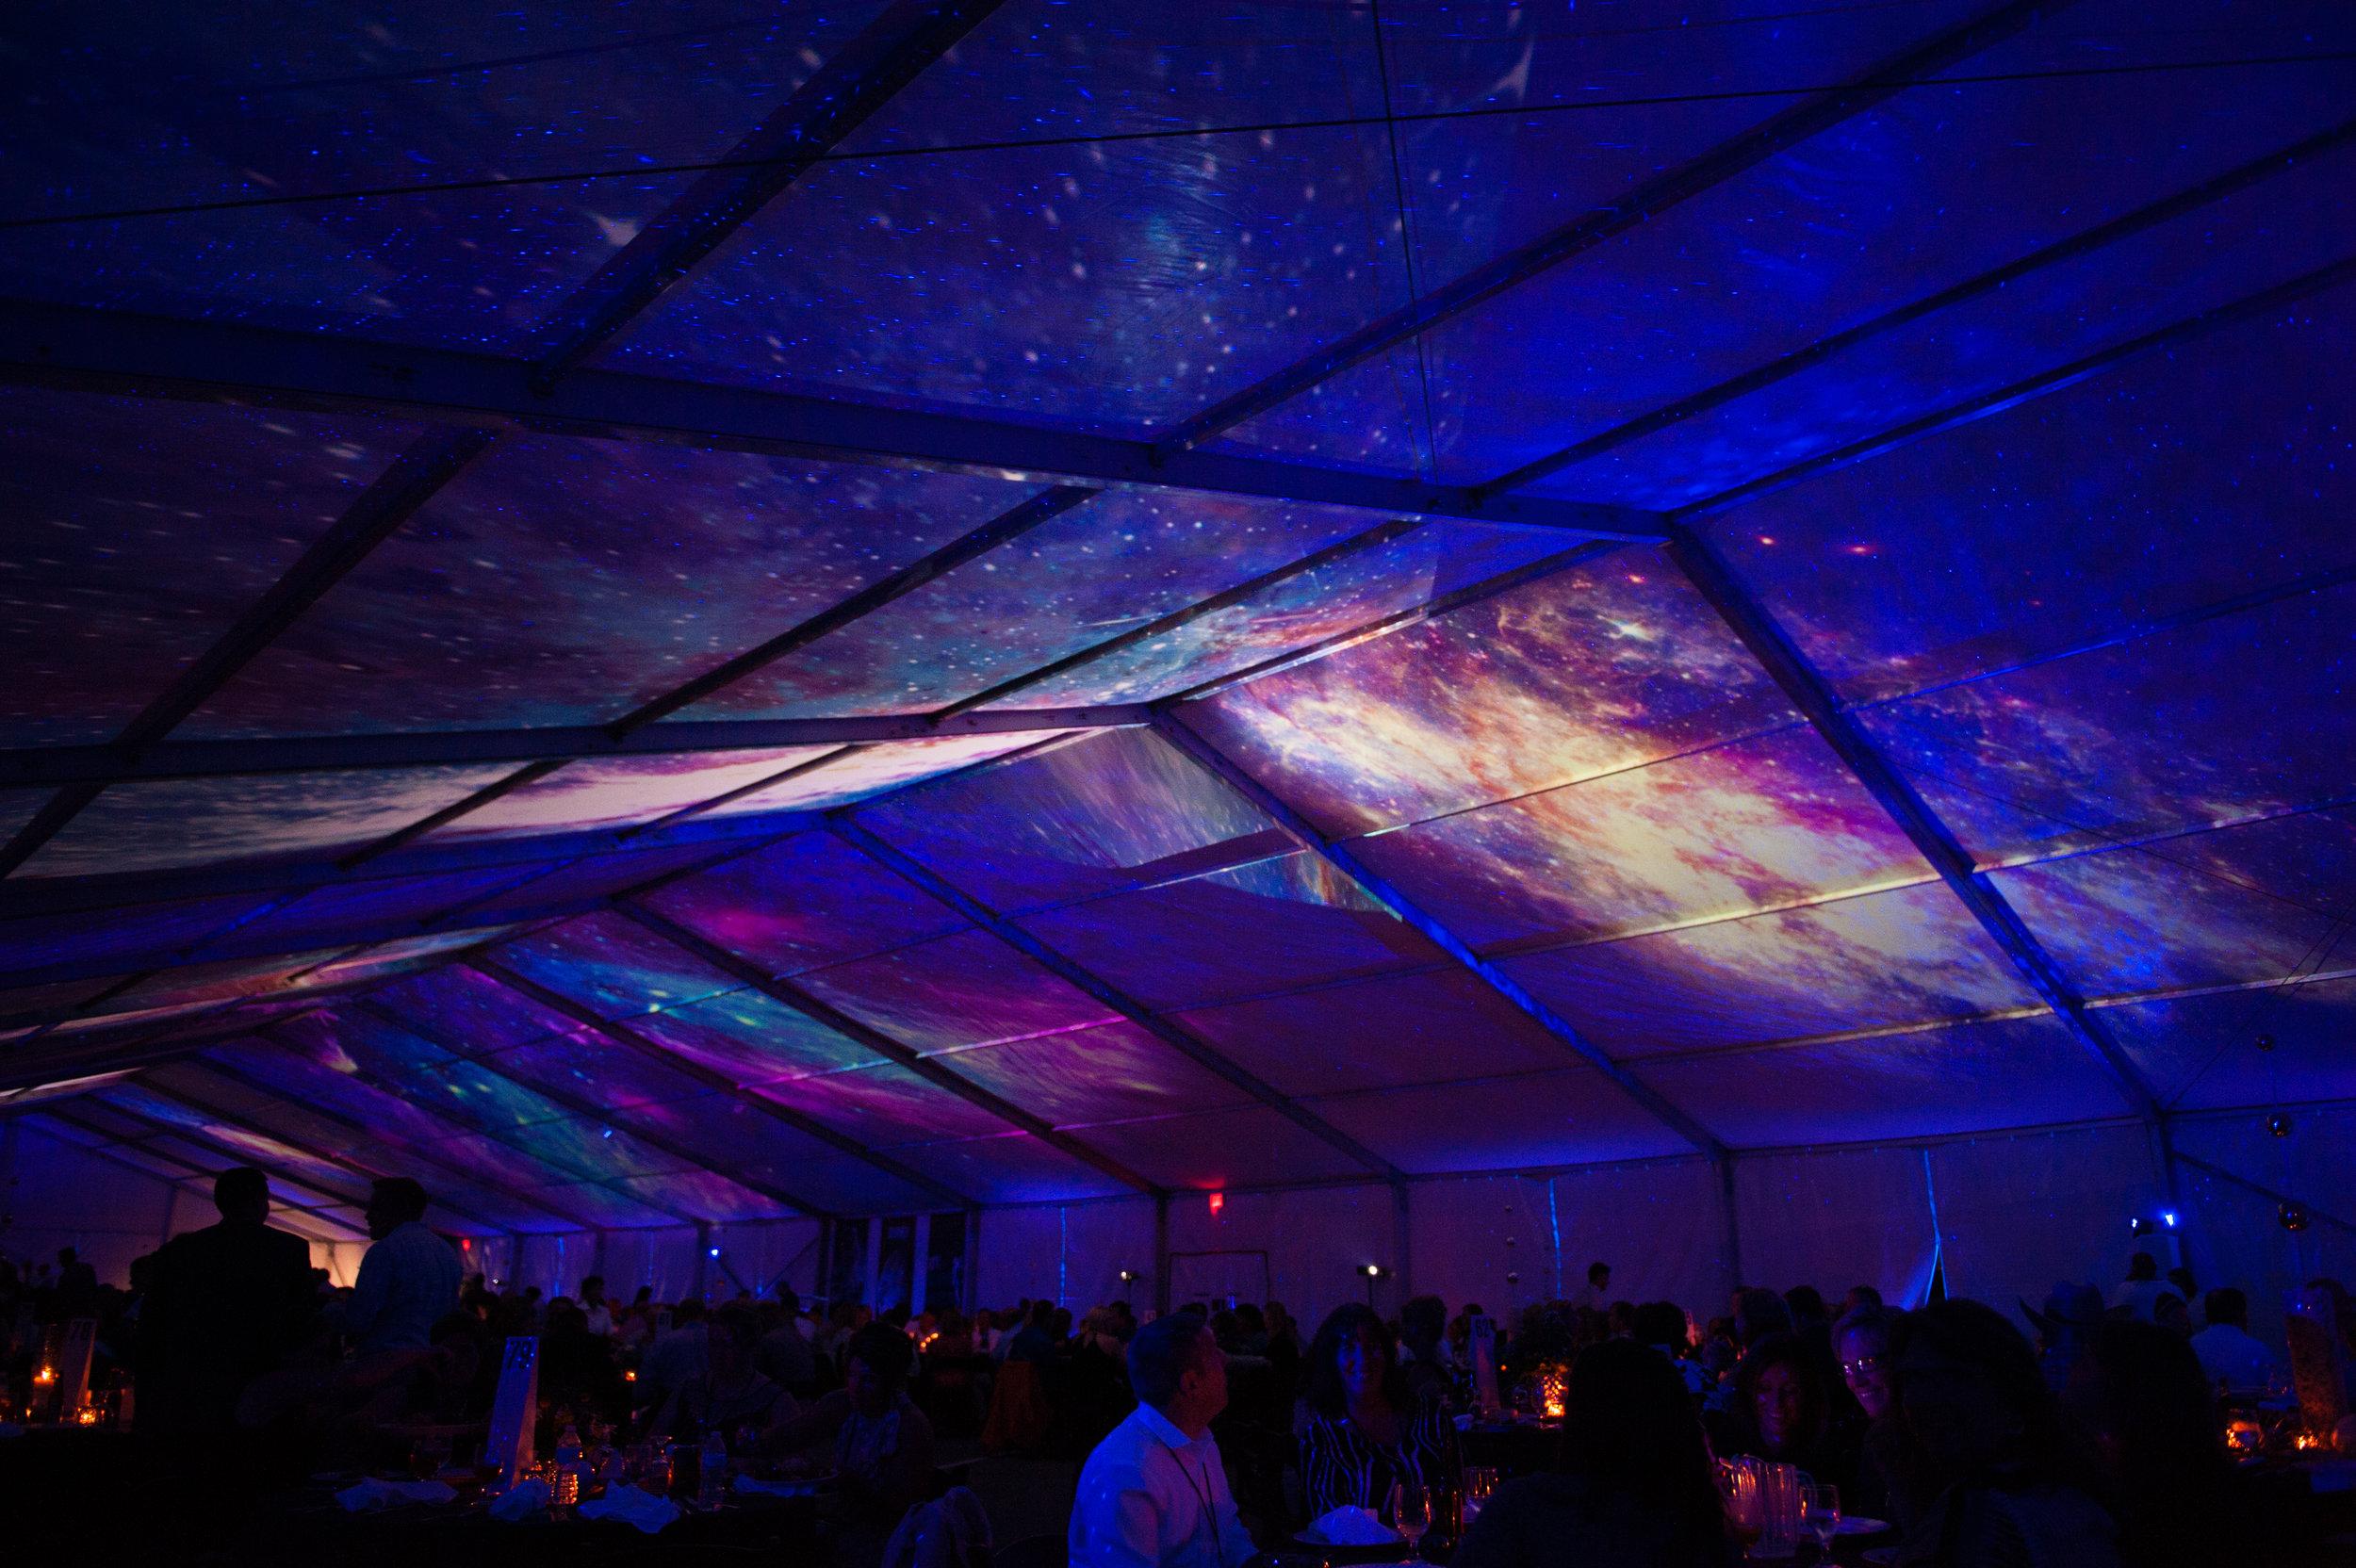 Journey 2016 Neil Armstrong Tent Lighting (2).jpg